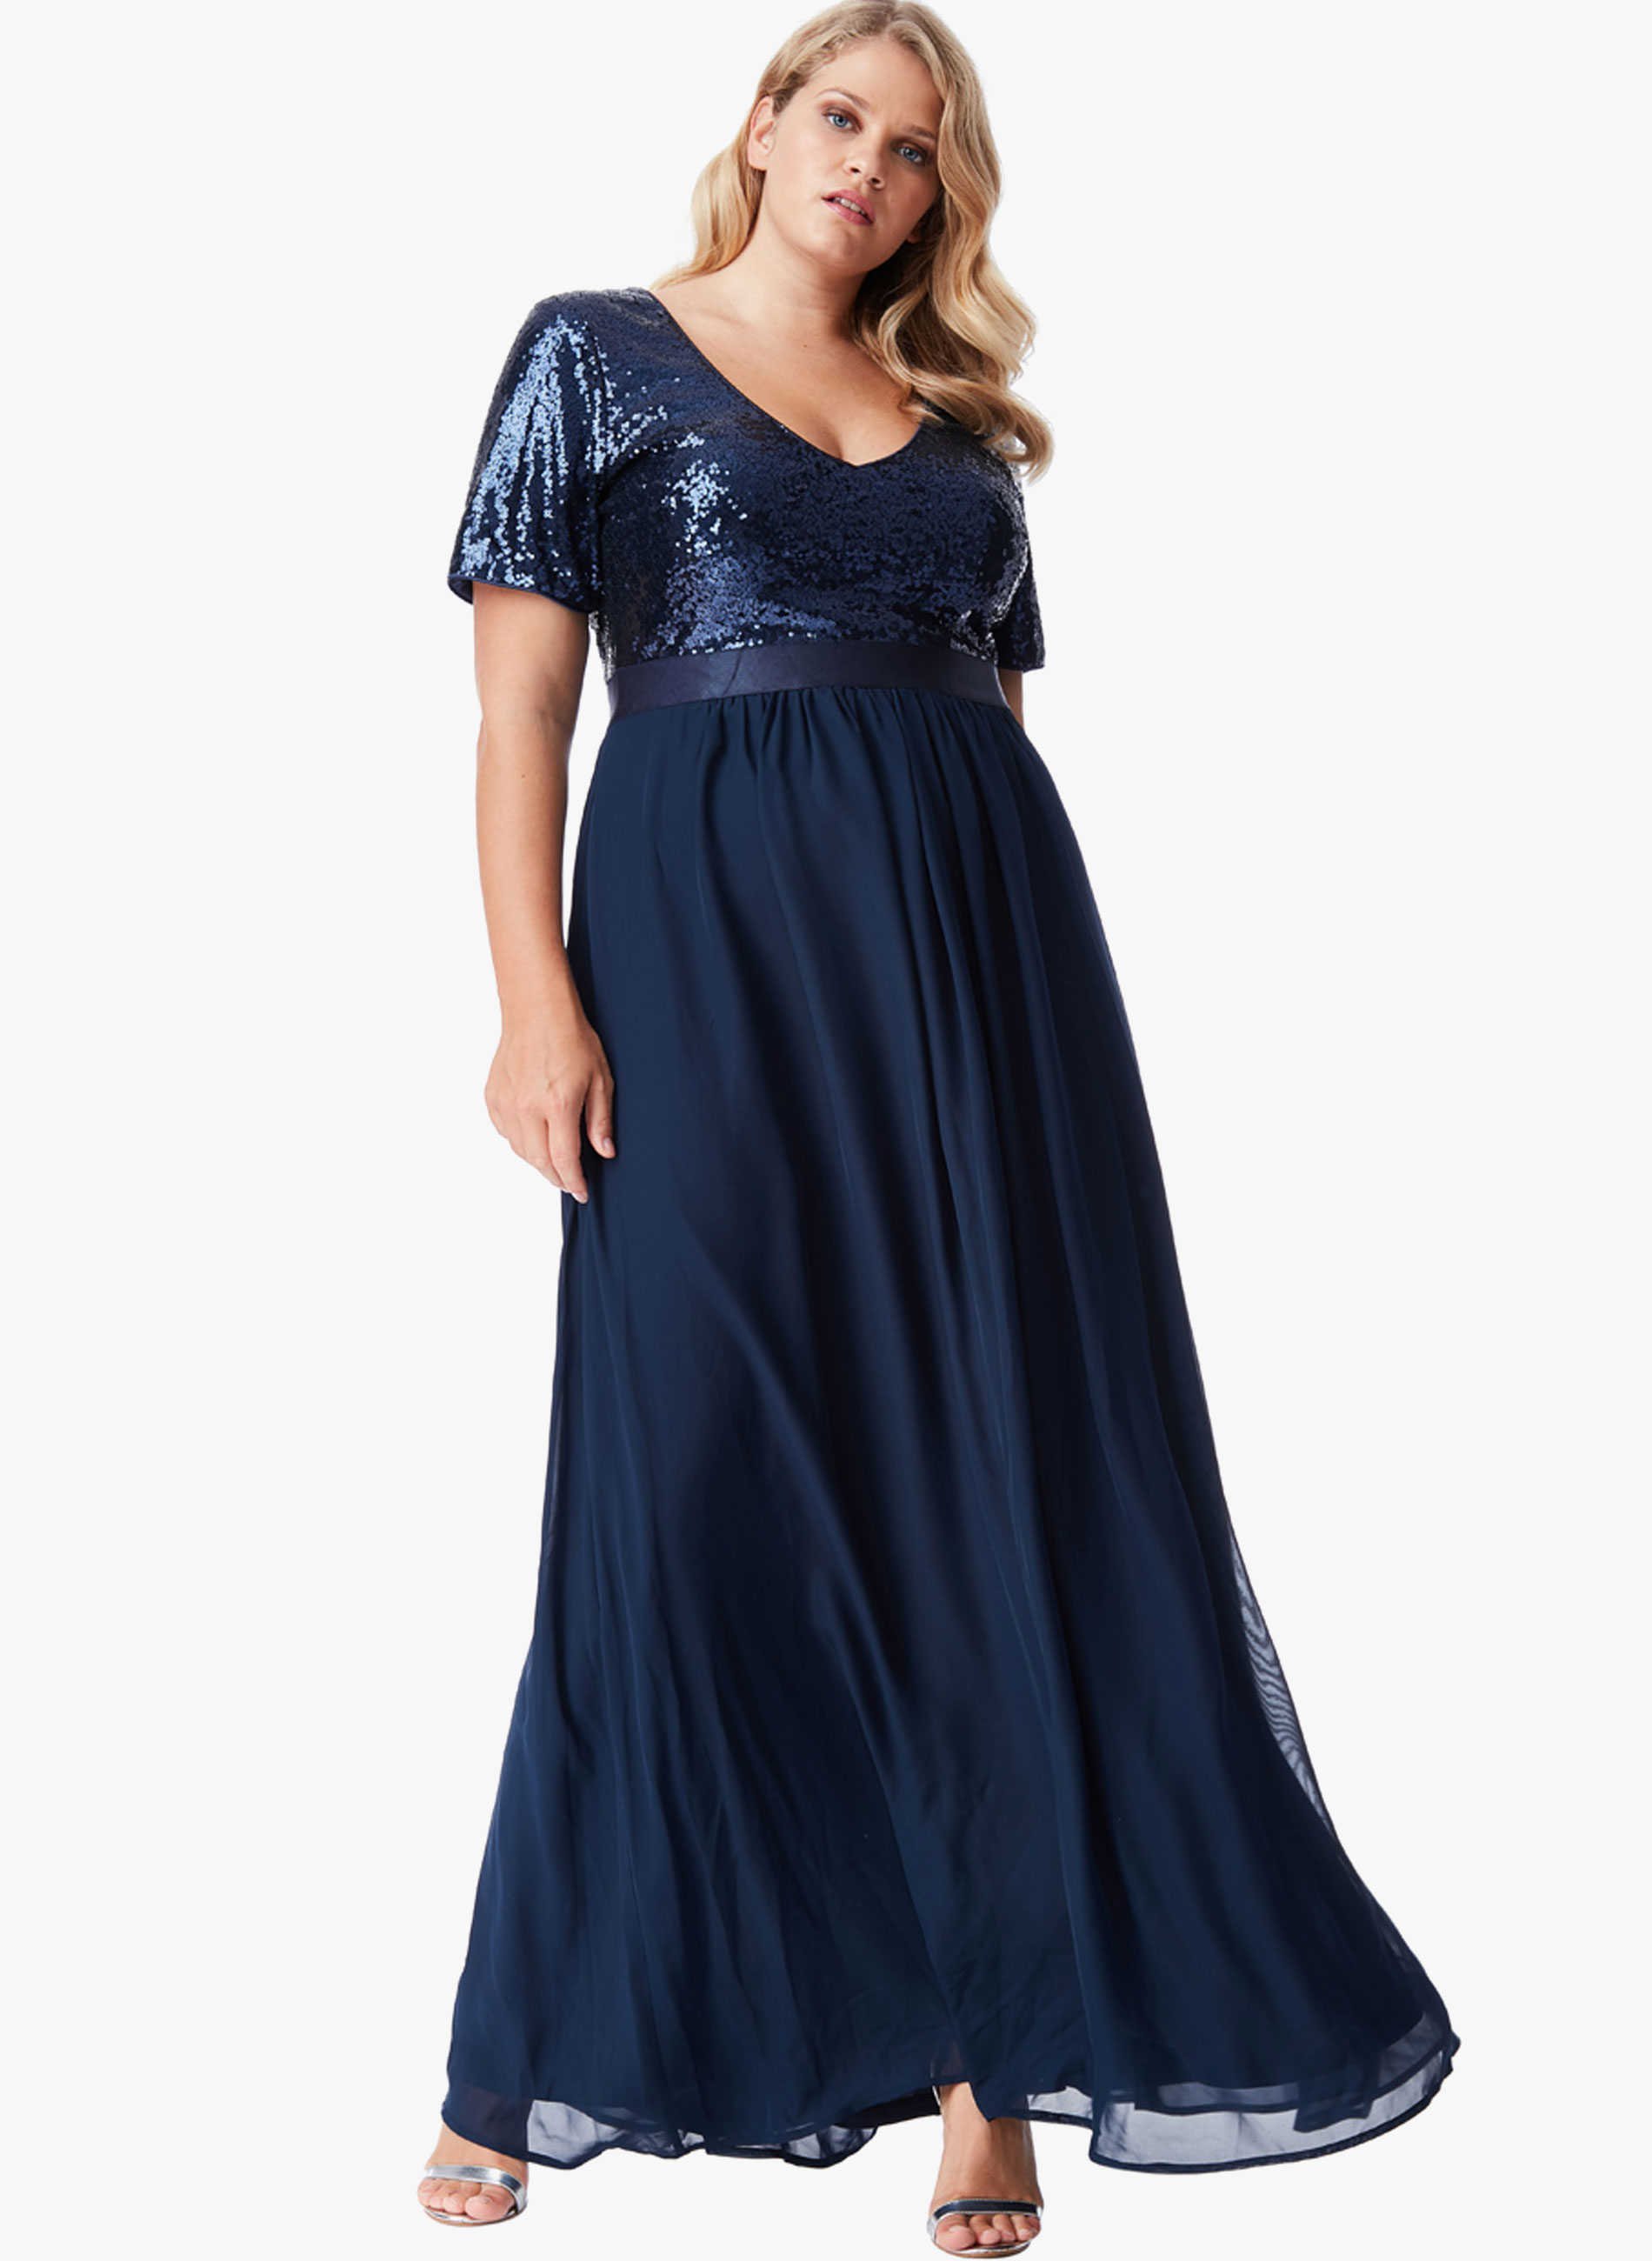 60f03b824b94 ΜΕΓΑΛΑ ΜΕΓΕΘΗ ΦΟΡΕΜΑΤΑ :: Φόρεμα Μάξι Navy με Παγιέτα - Μόδα σε ...